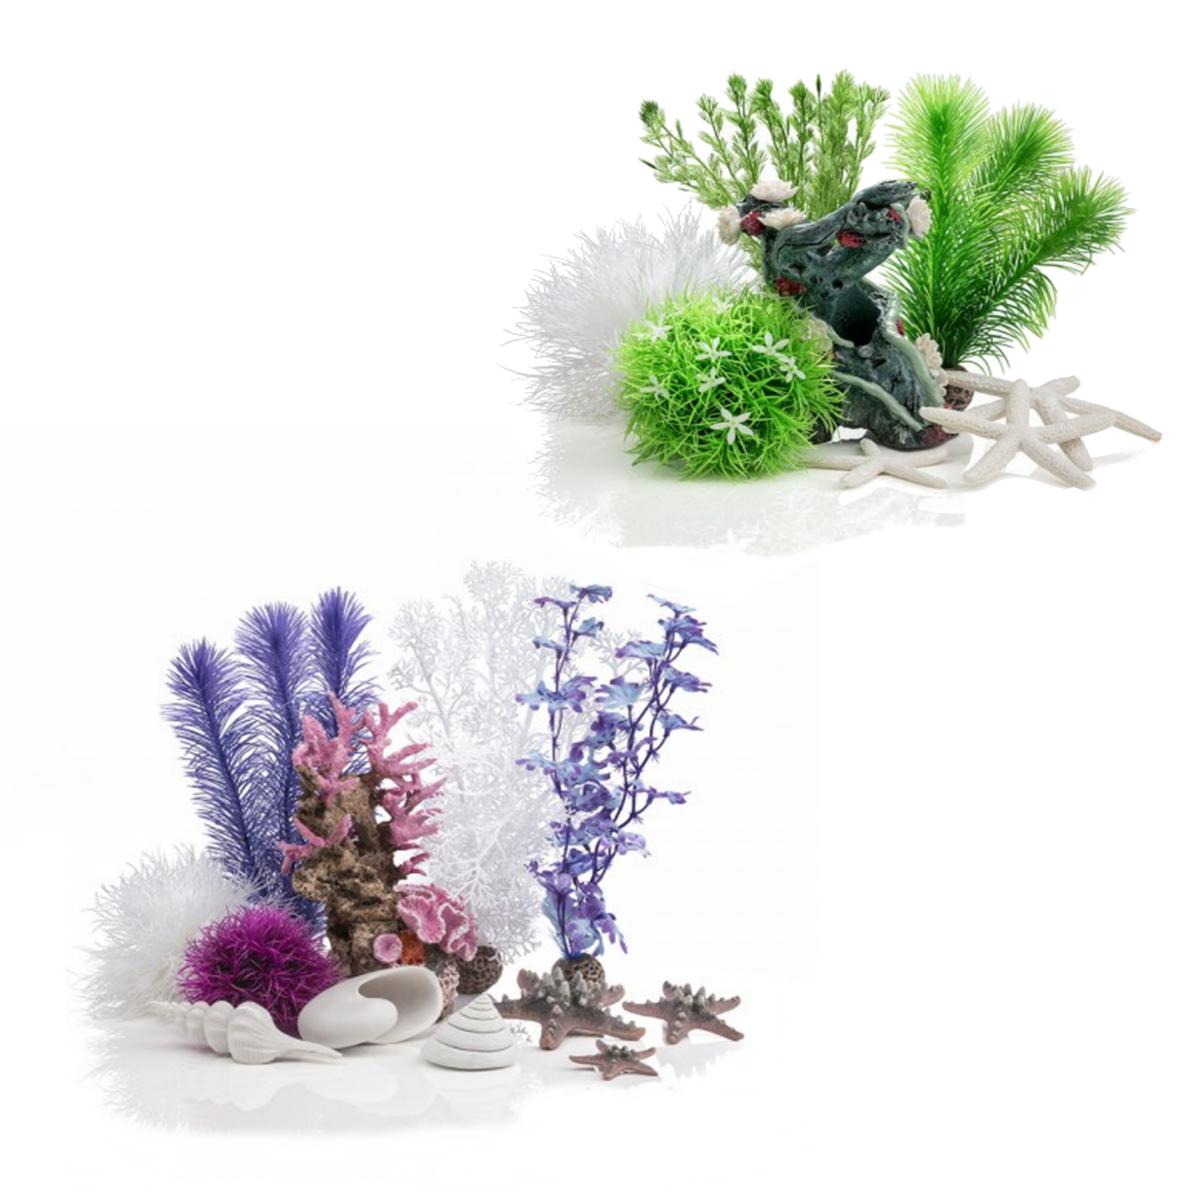 Oase biorb aquarium complete decor sets for Aquarium decoration kits